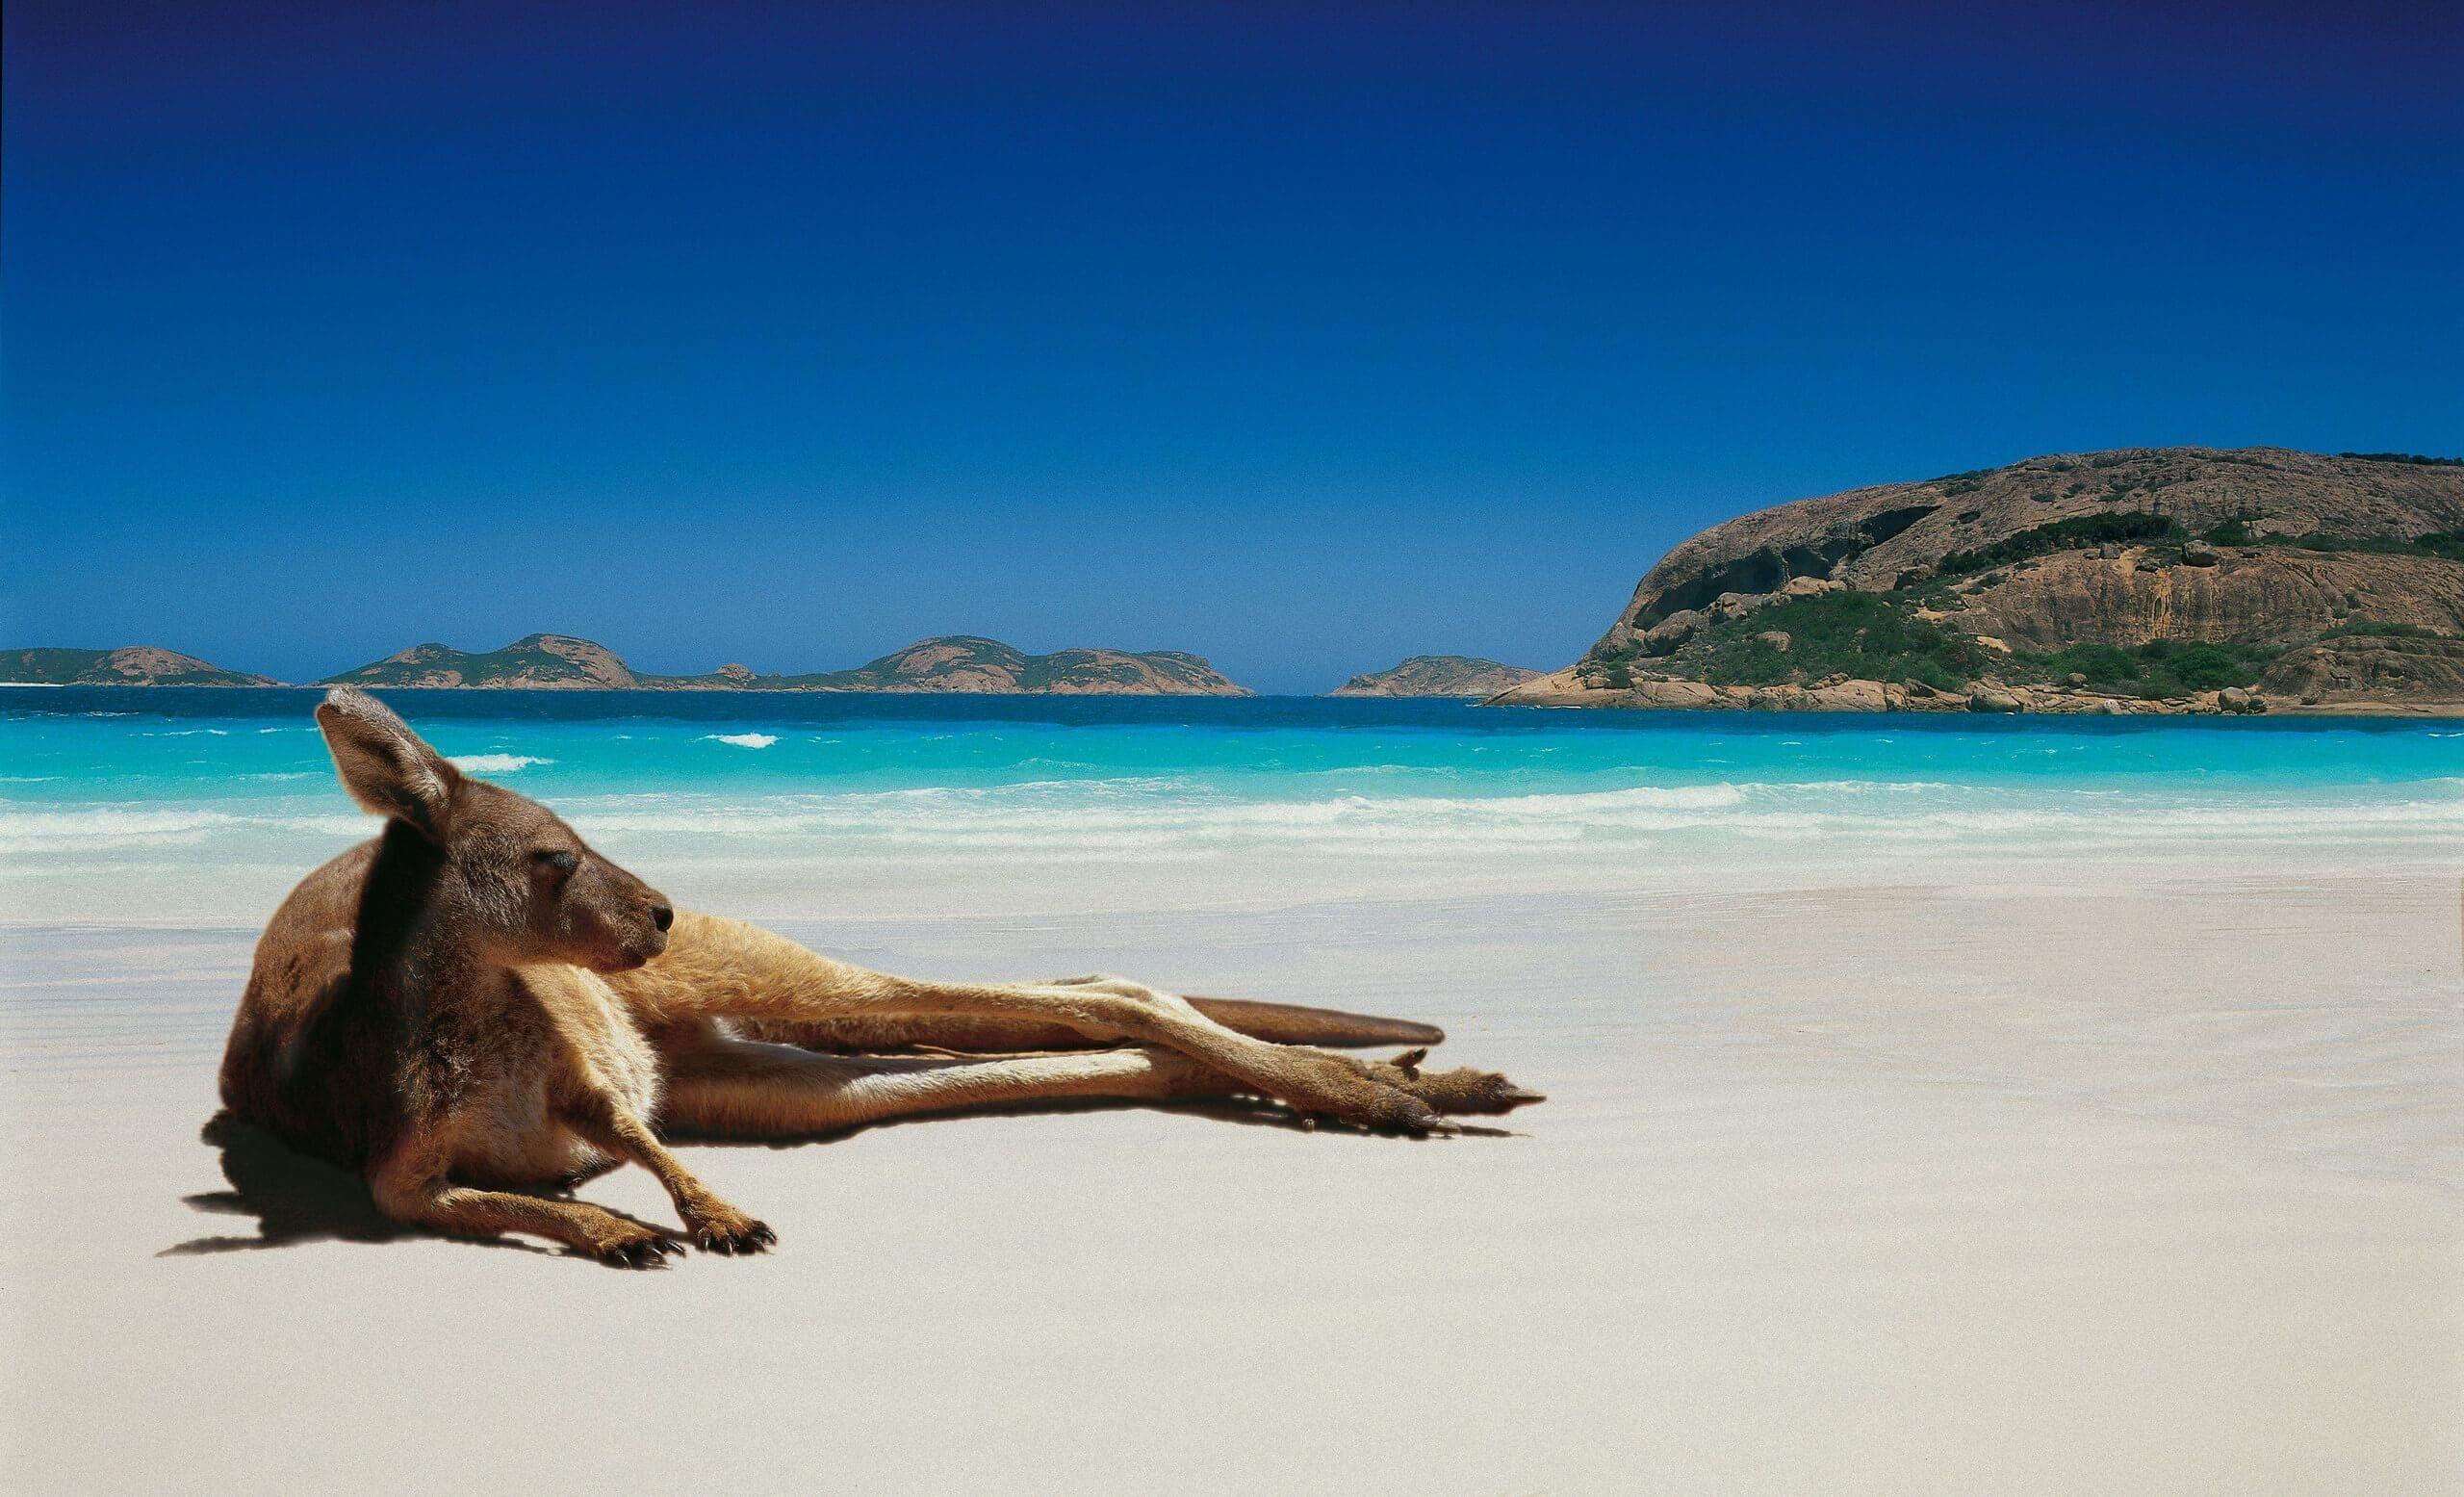 Reasons to never visit Australia.